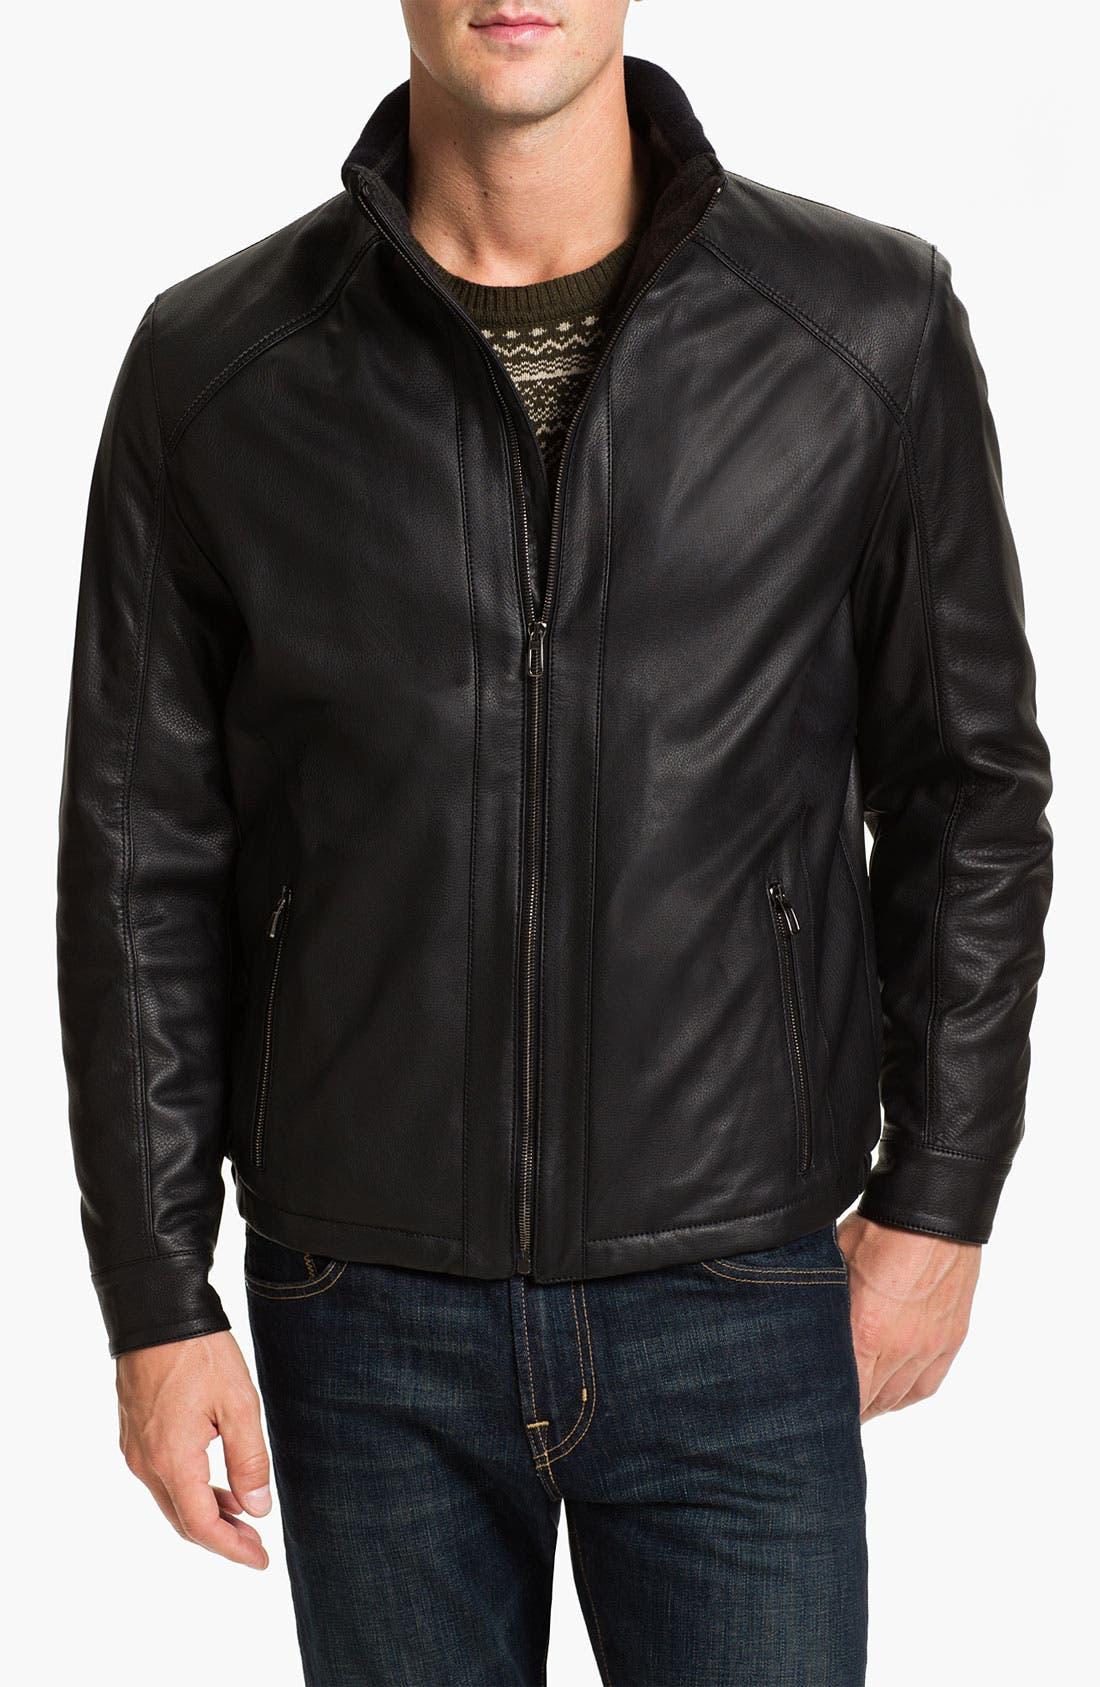 Main Image - Gian Franco Pagini Leather Jacket